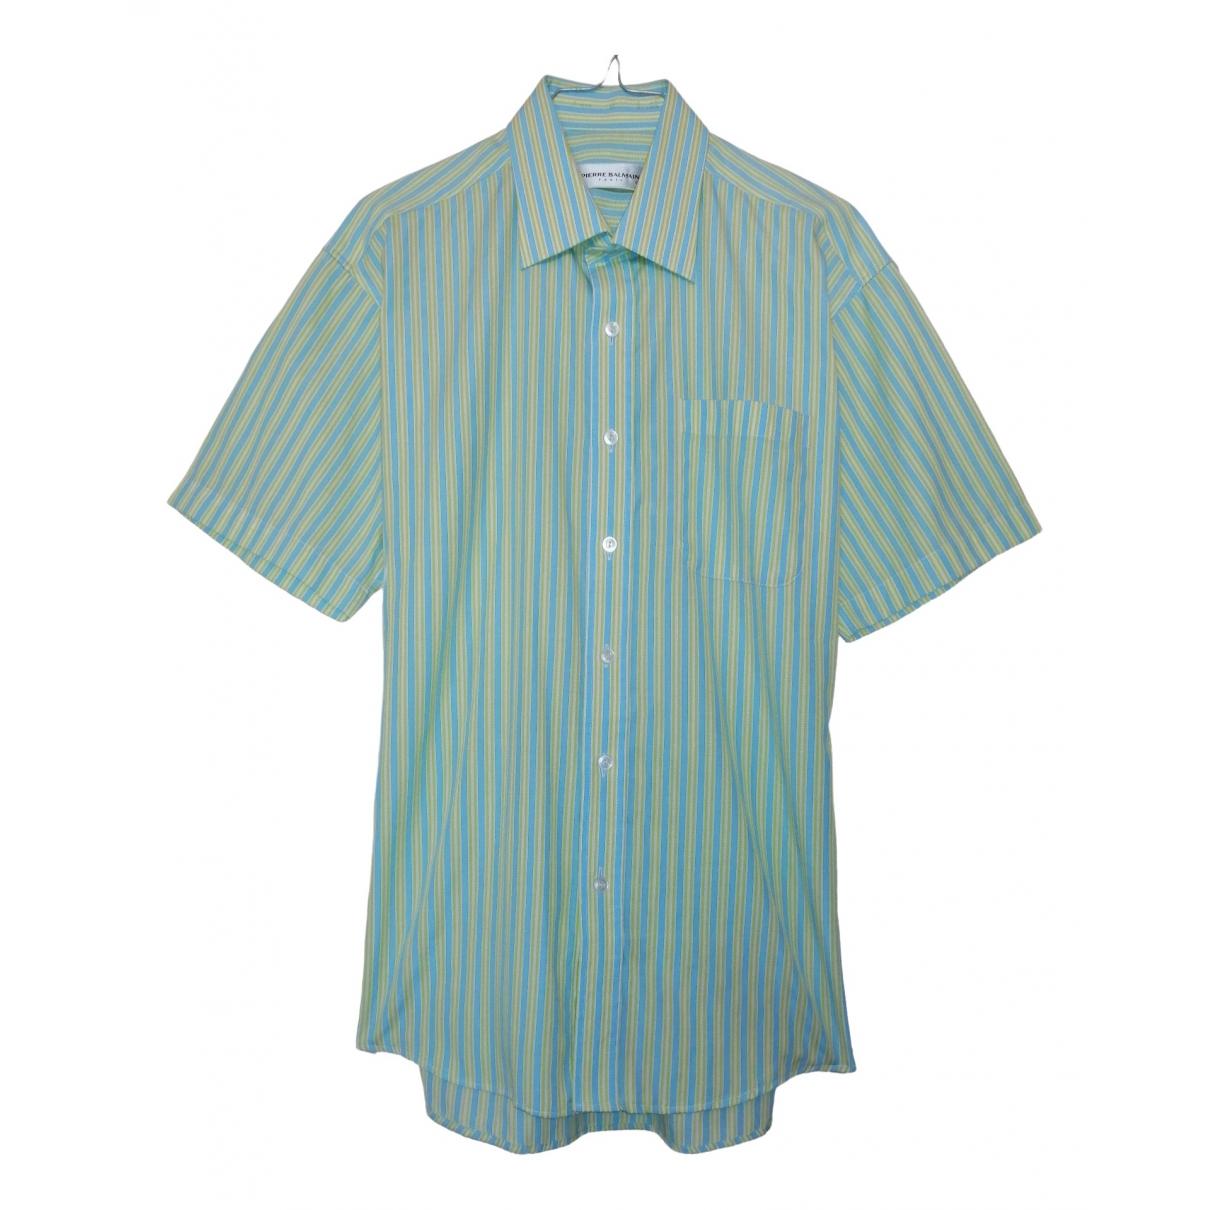 Pierre Balmain \N Green Cotton Shirts for Men M International